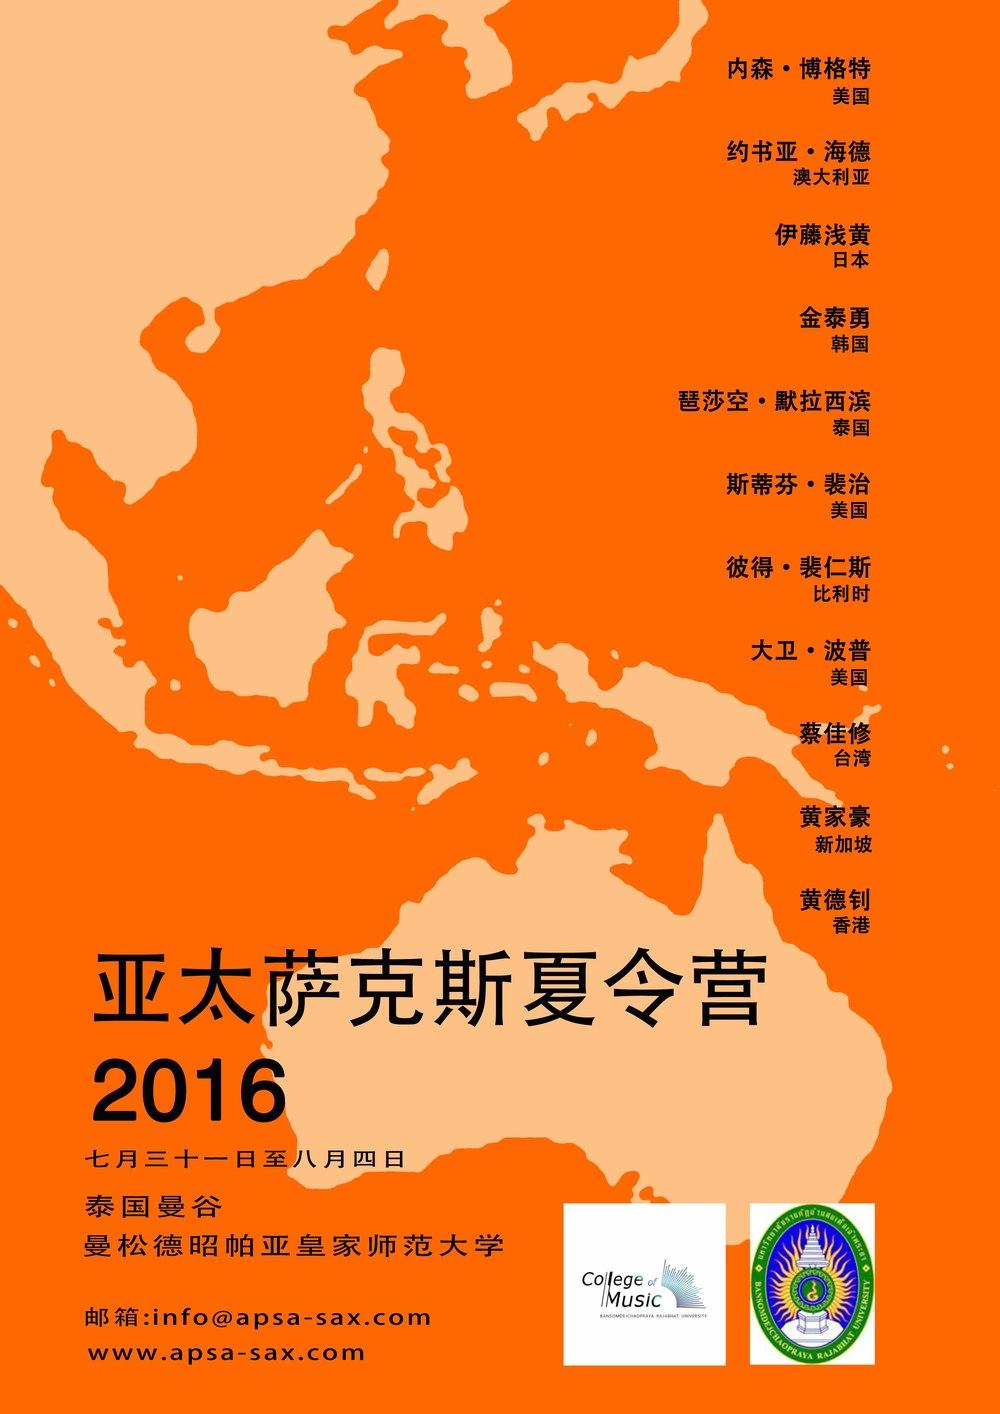 ASPA Poster 2016 Chinese version.jpg